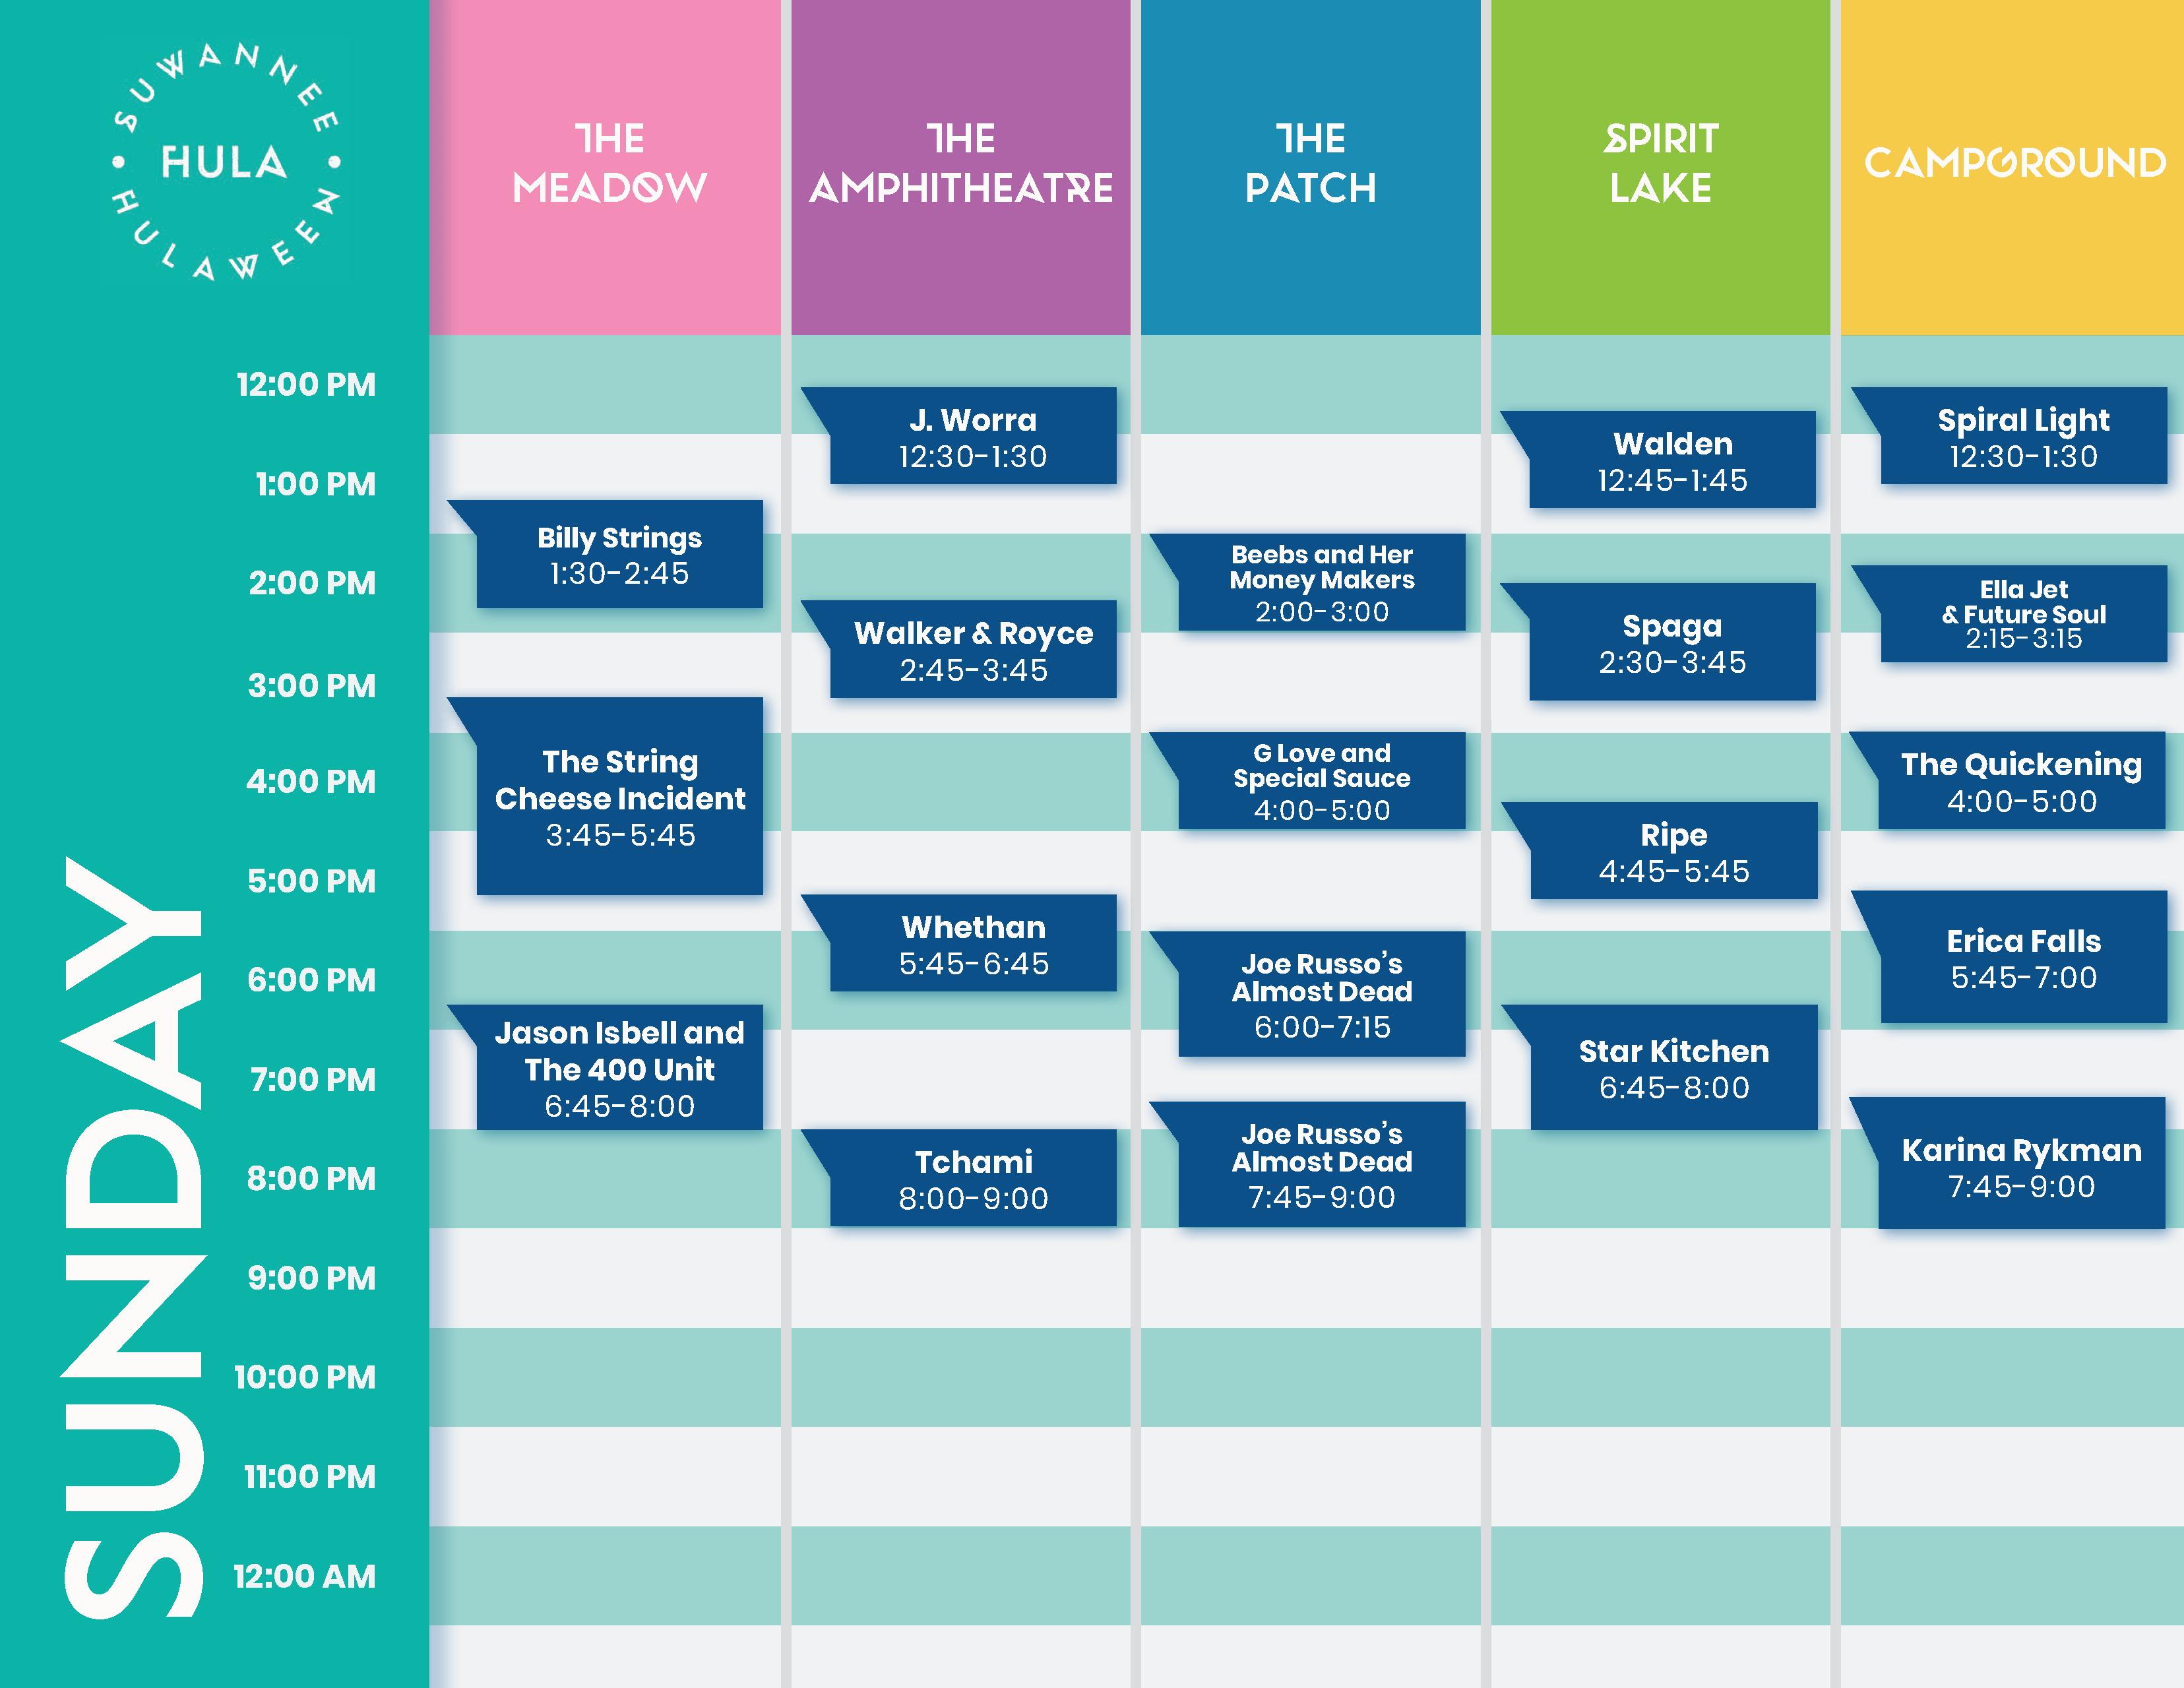 Suwannee Hulaween 2019 Sunday Lineup